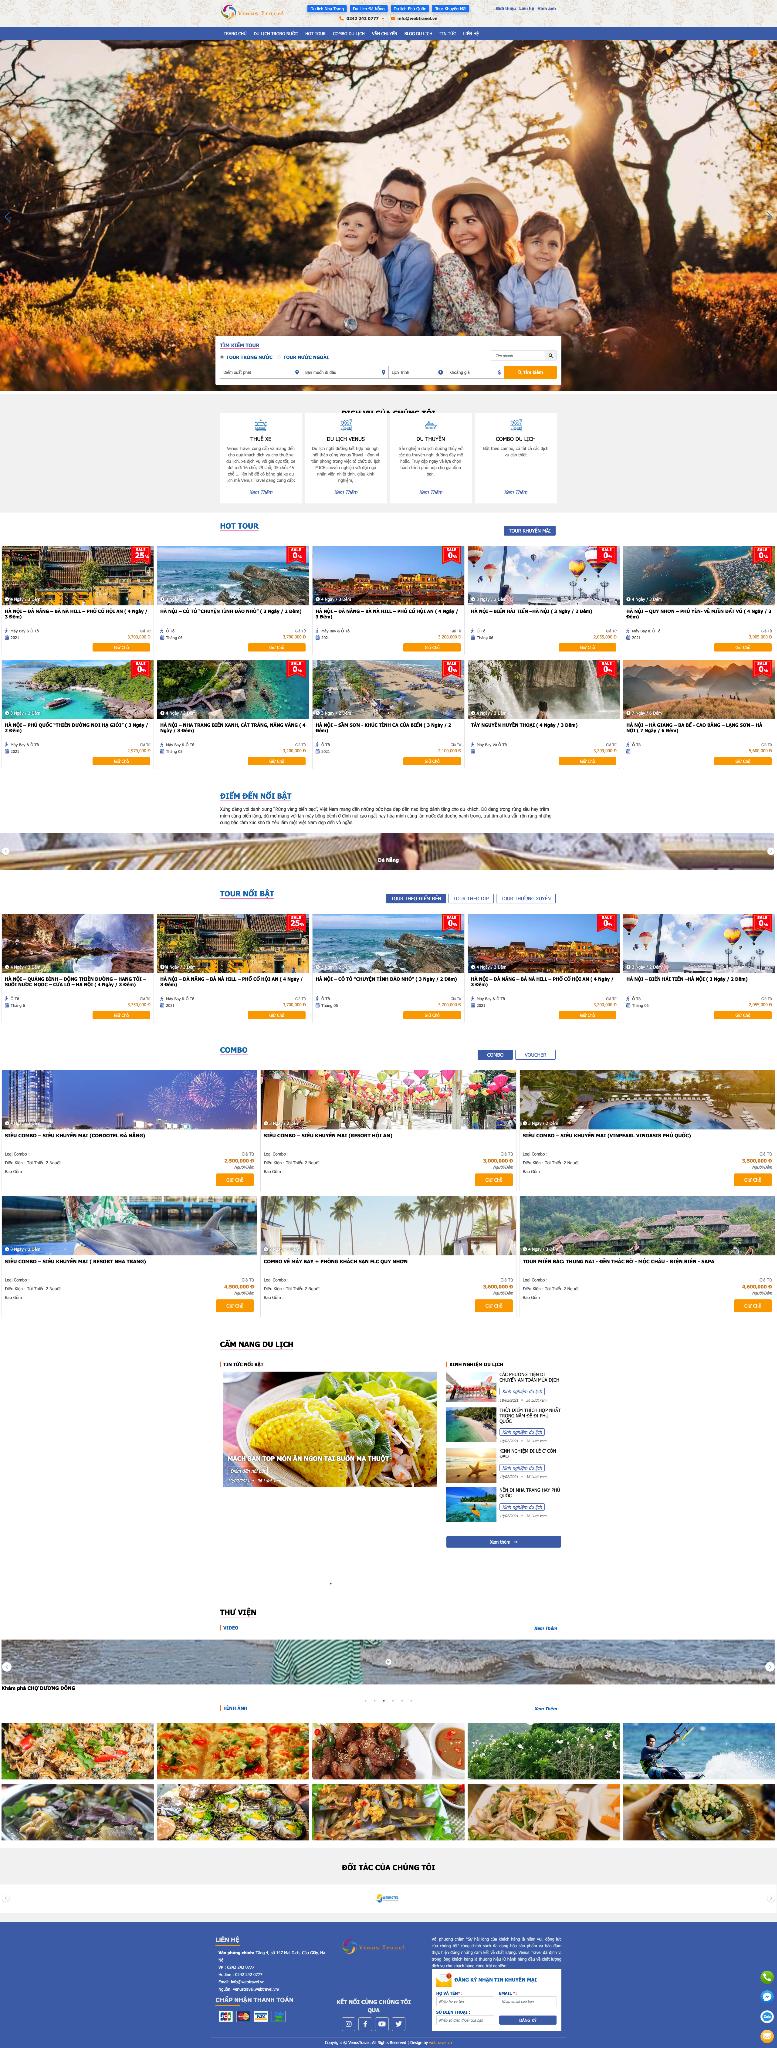 Mẫu website du lịch 4